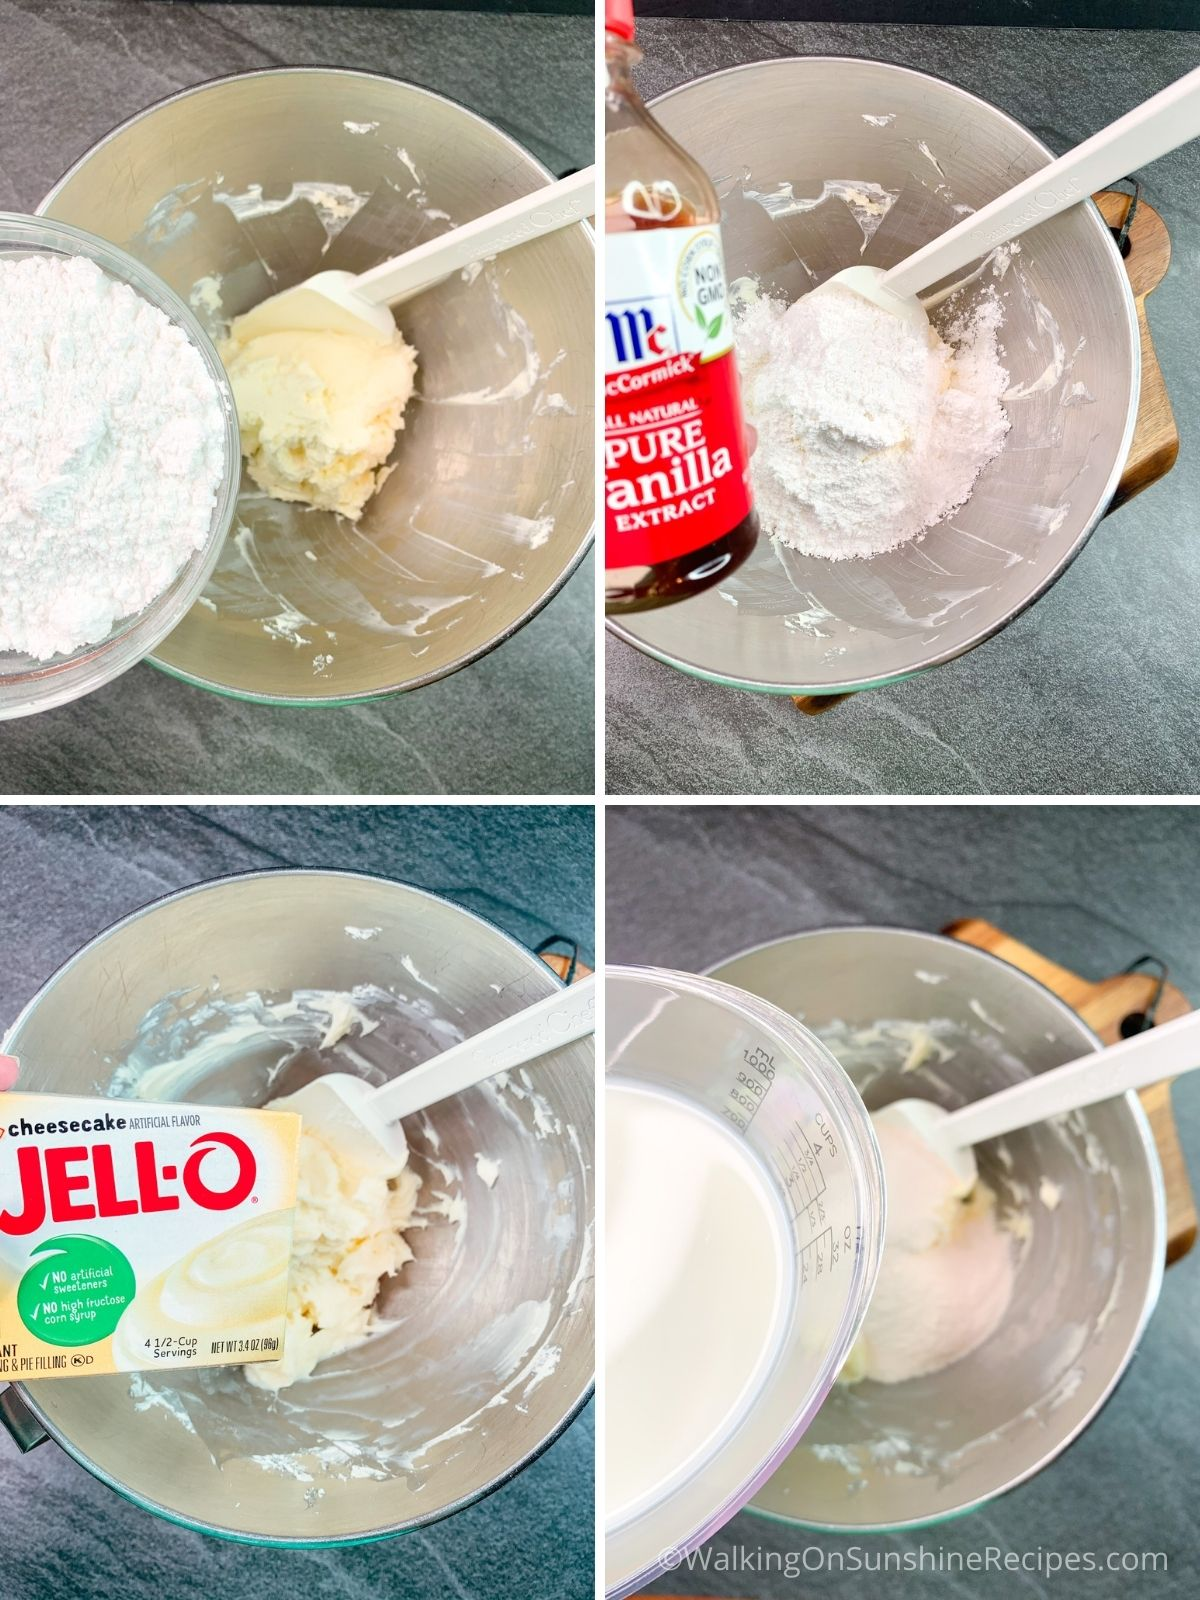 Adding pudding mix to cheesecake.